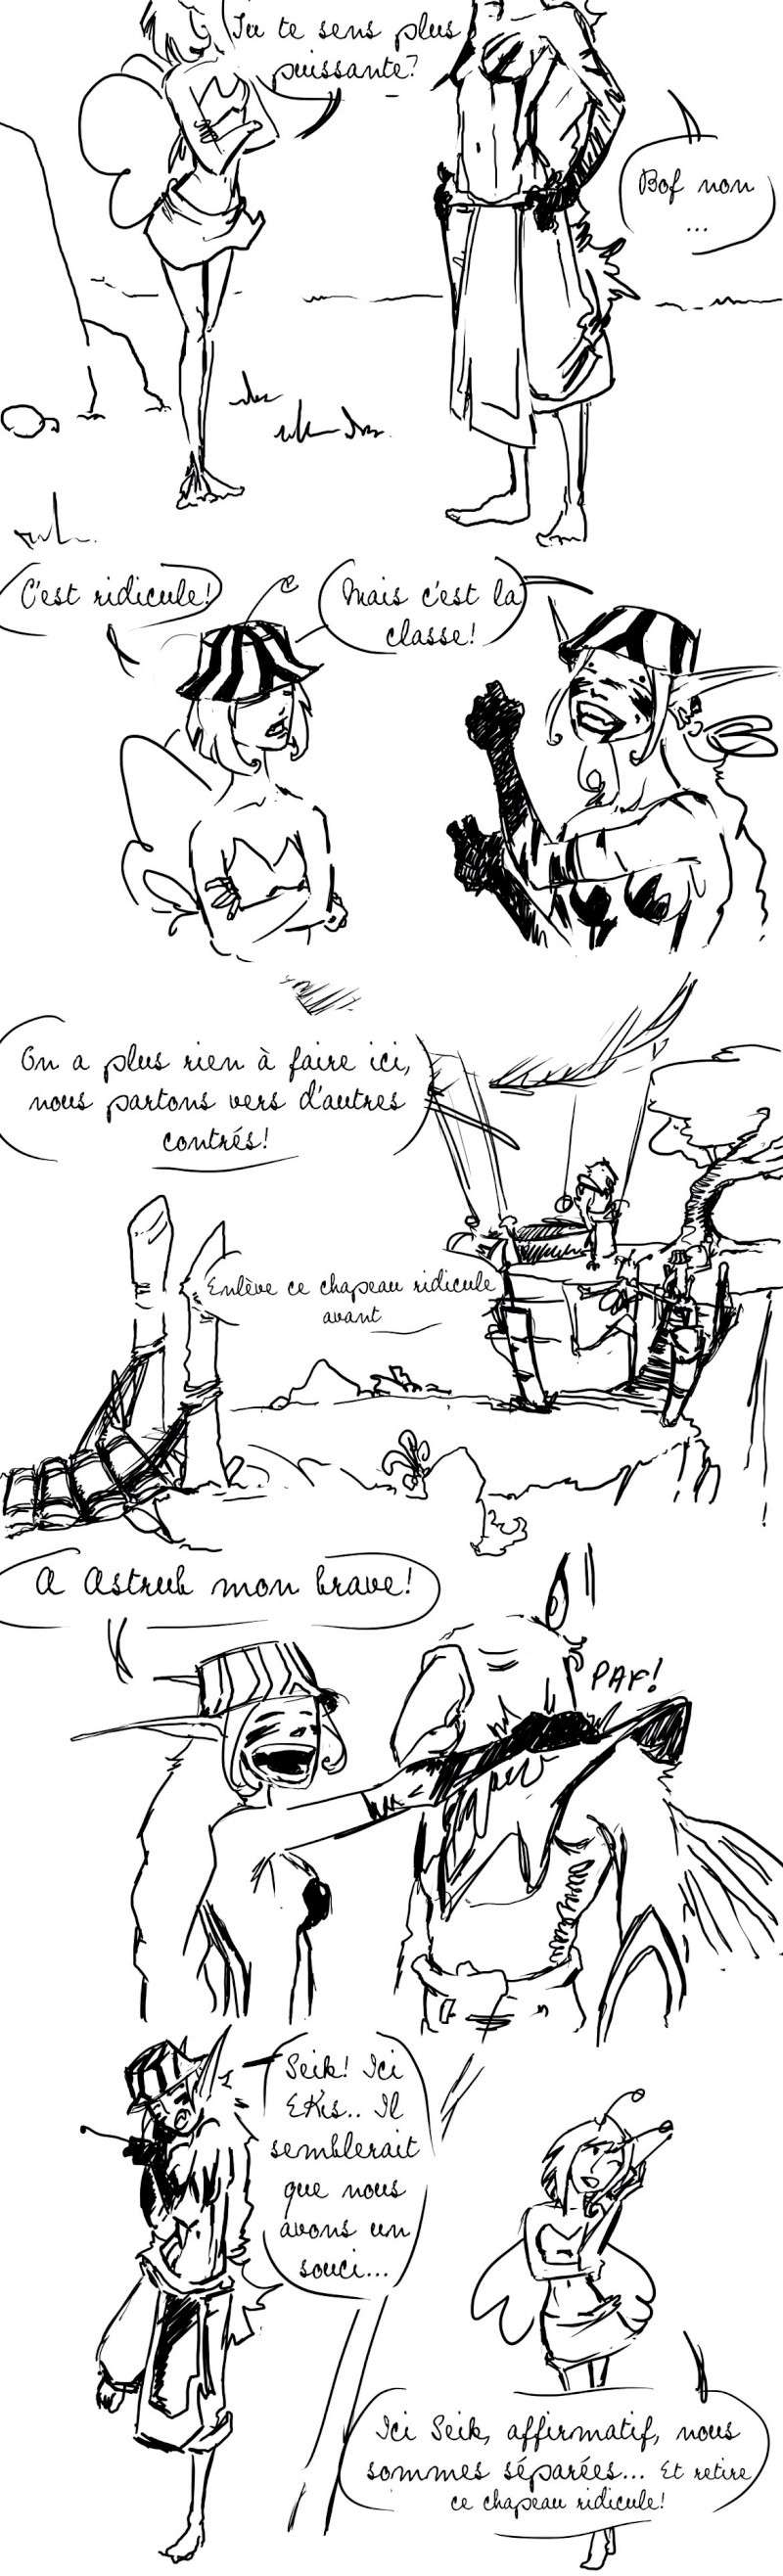 seik et ekis, les aventures ILLUSTREES - Page 4 Strip111